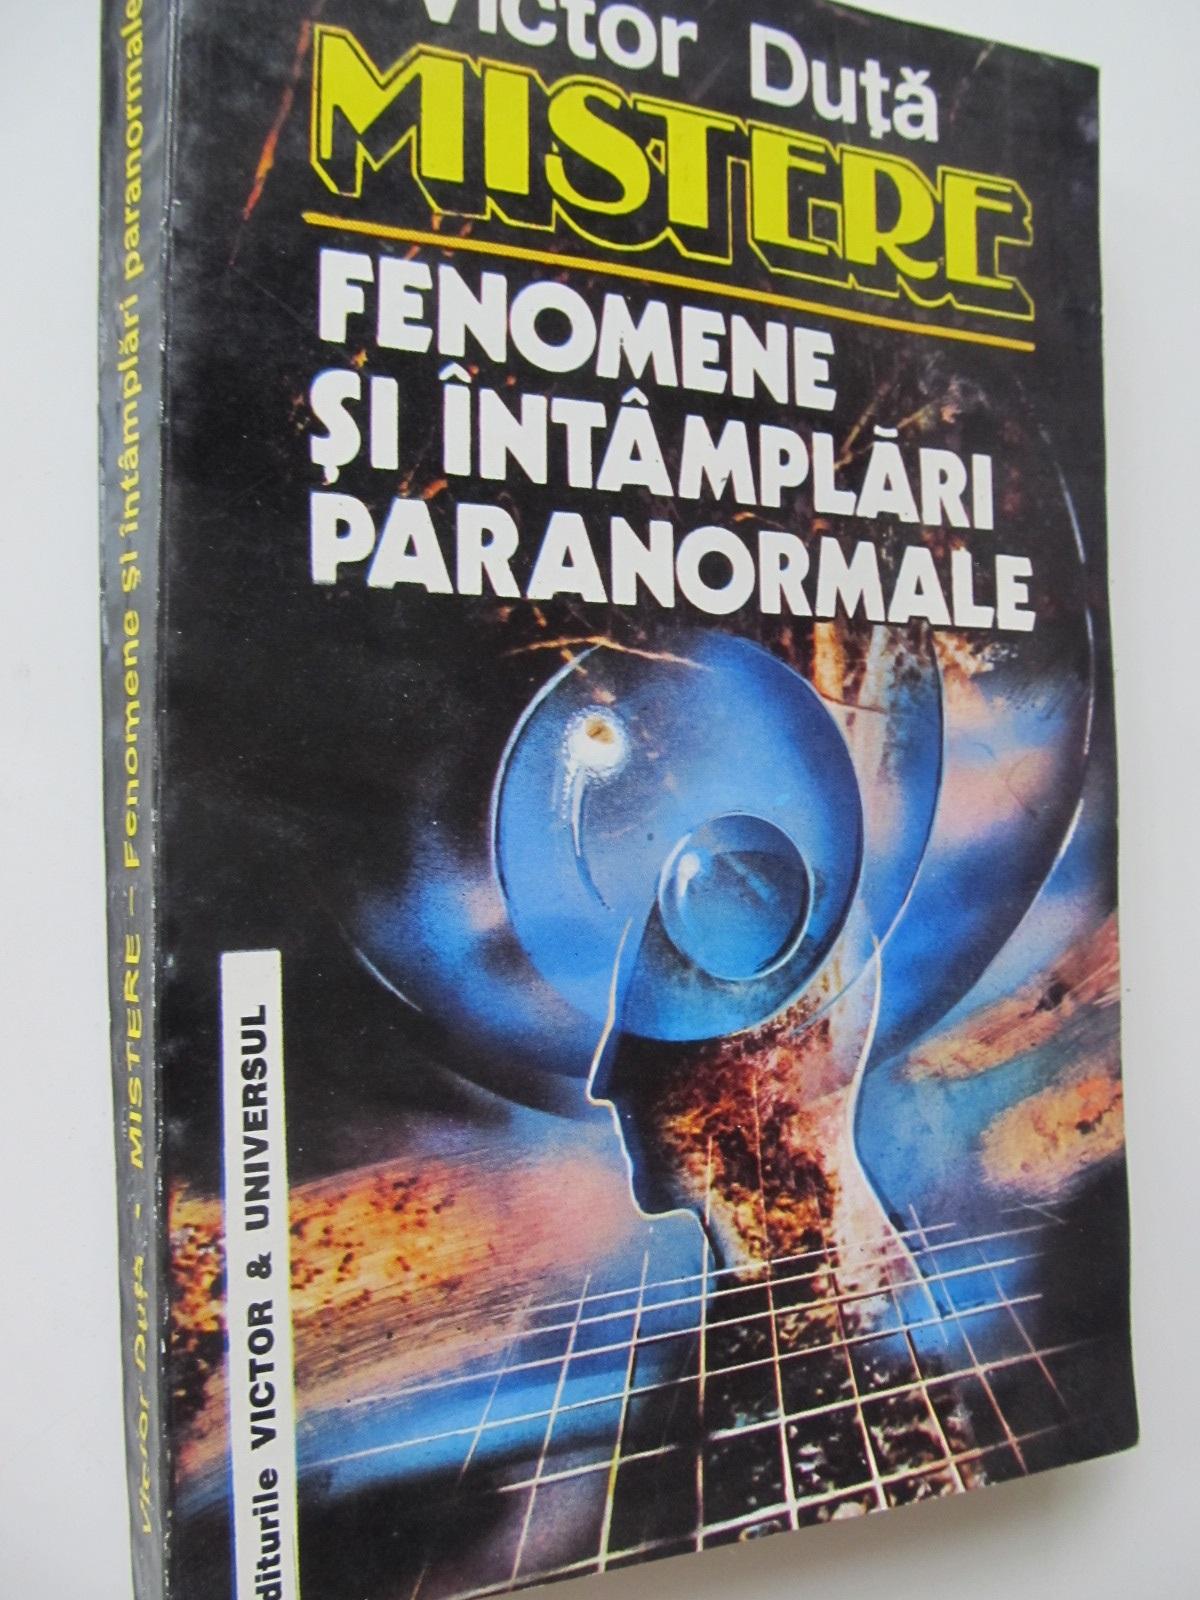 Mistere - Fenomene si intamplari paranormale - Victor Duta | Detalii carte